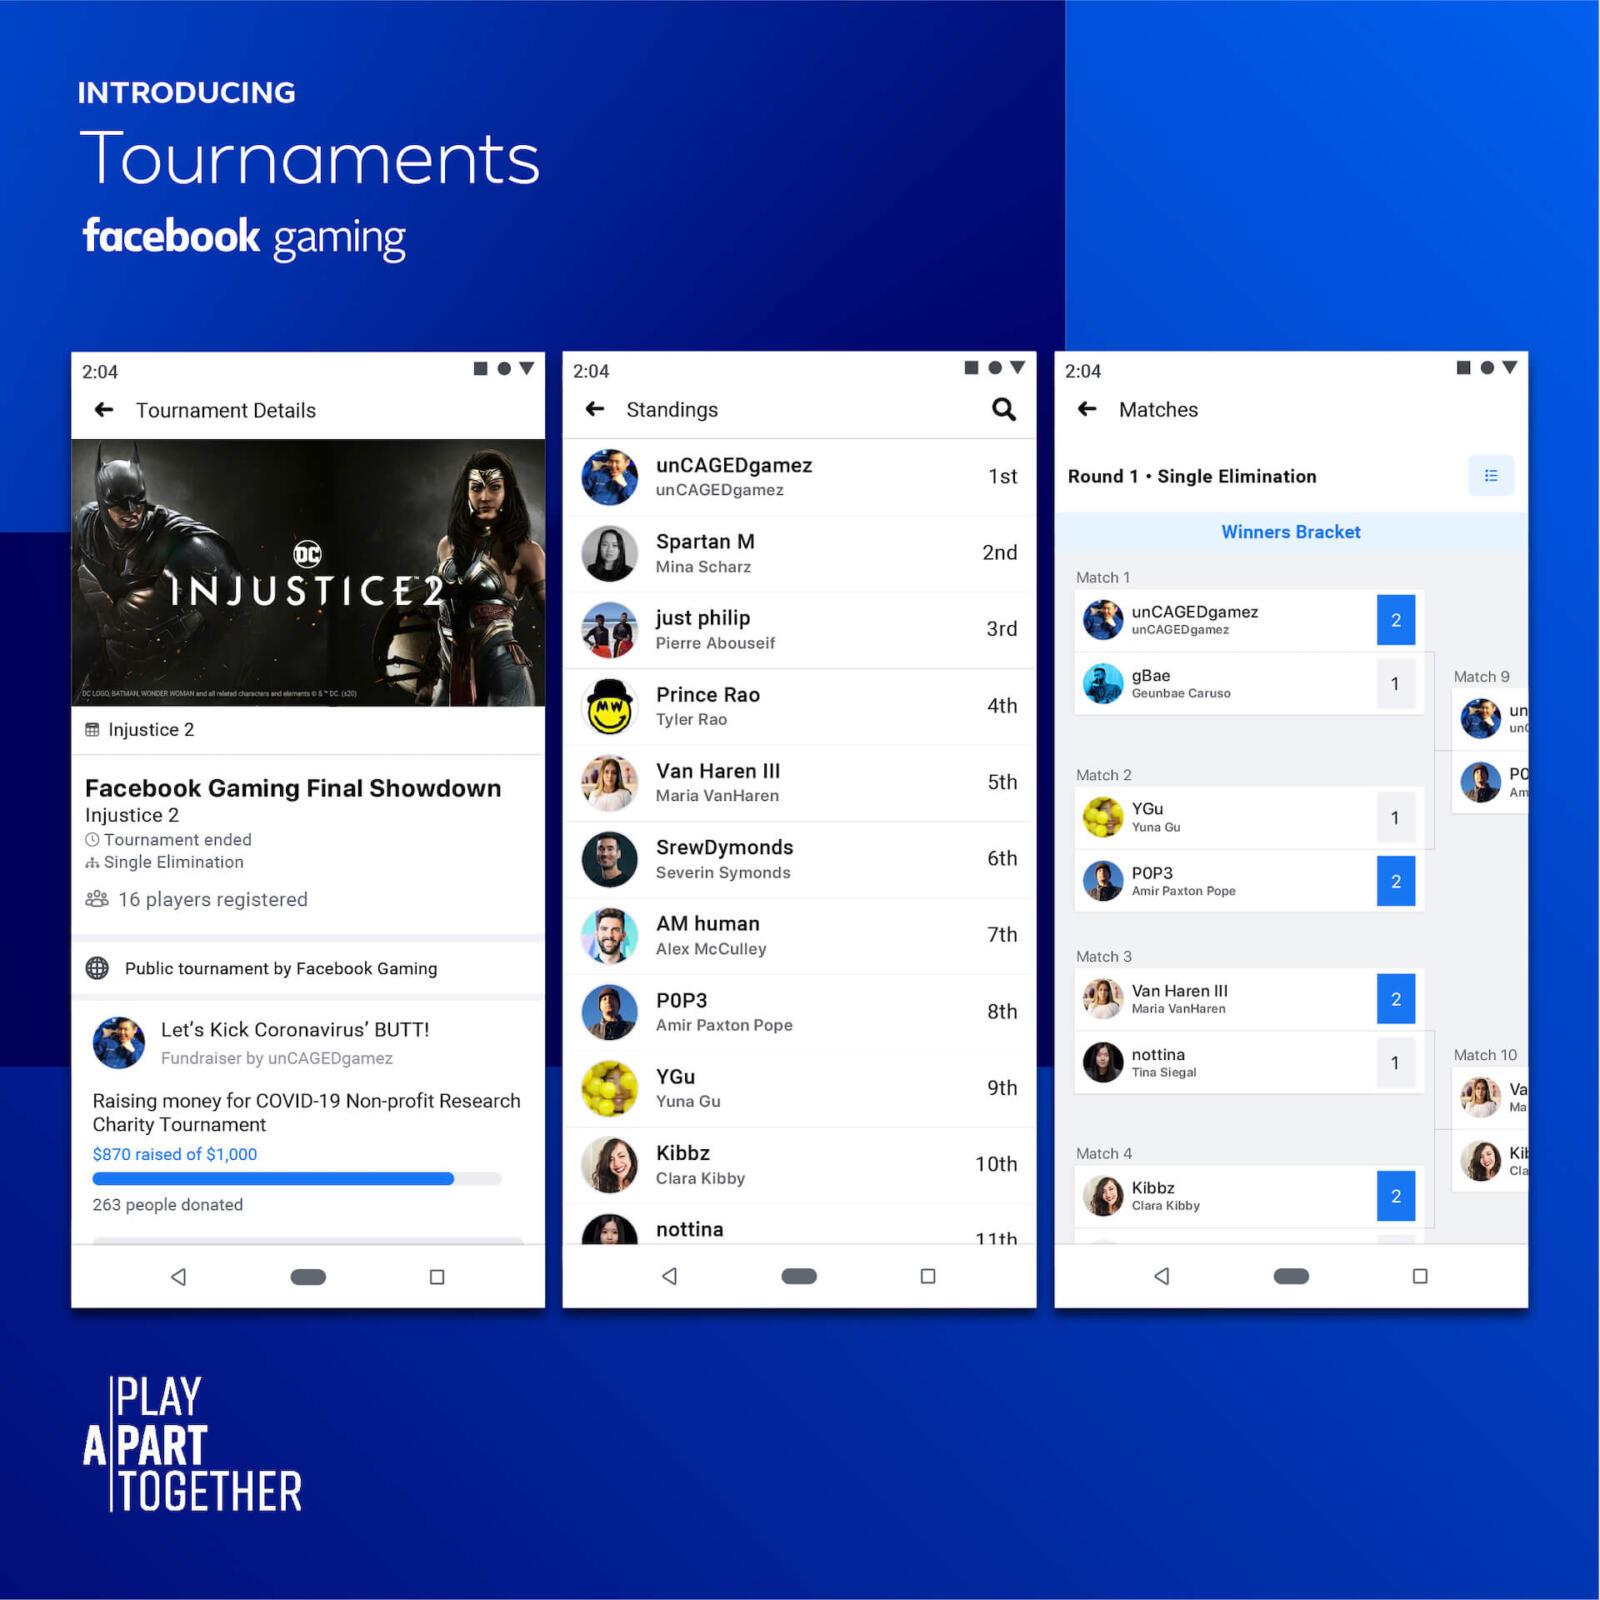 Facebook Gaming Tournaments 2